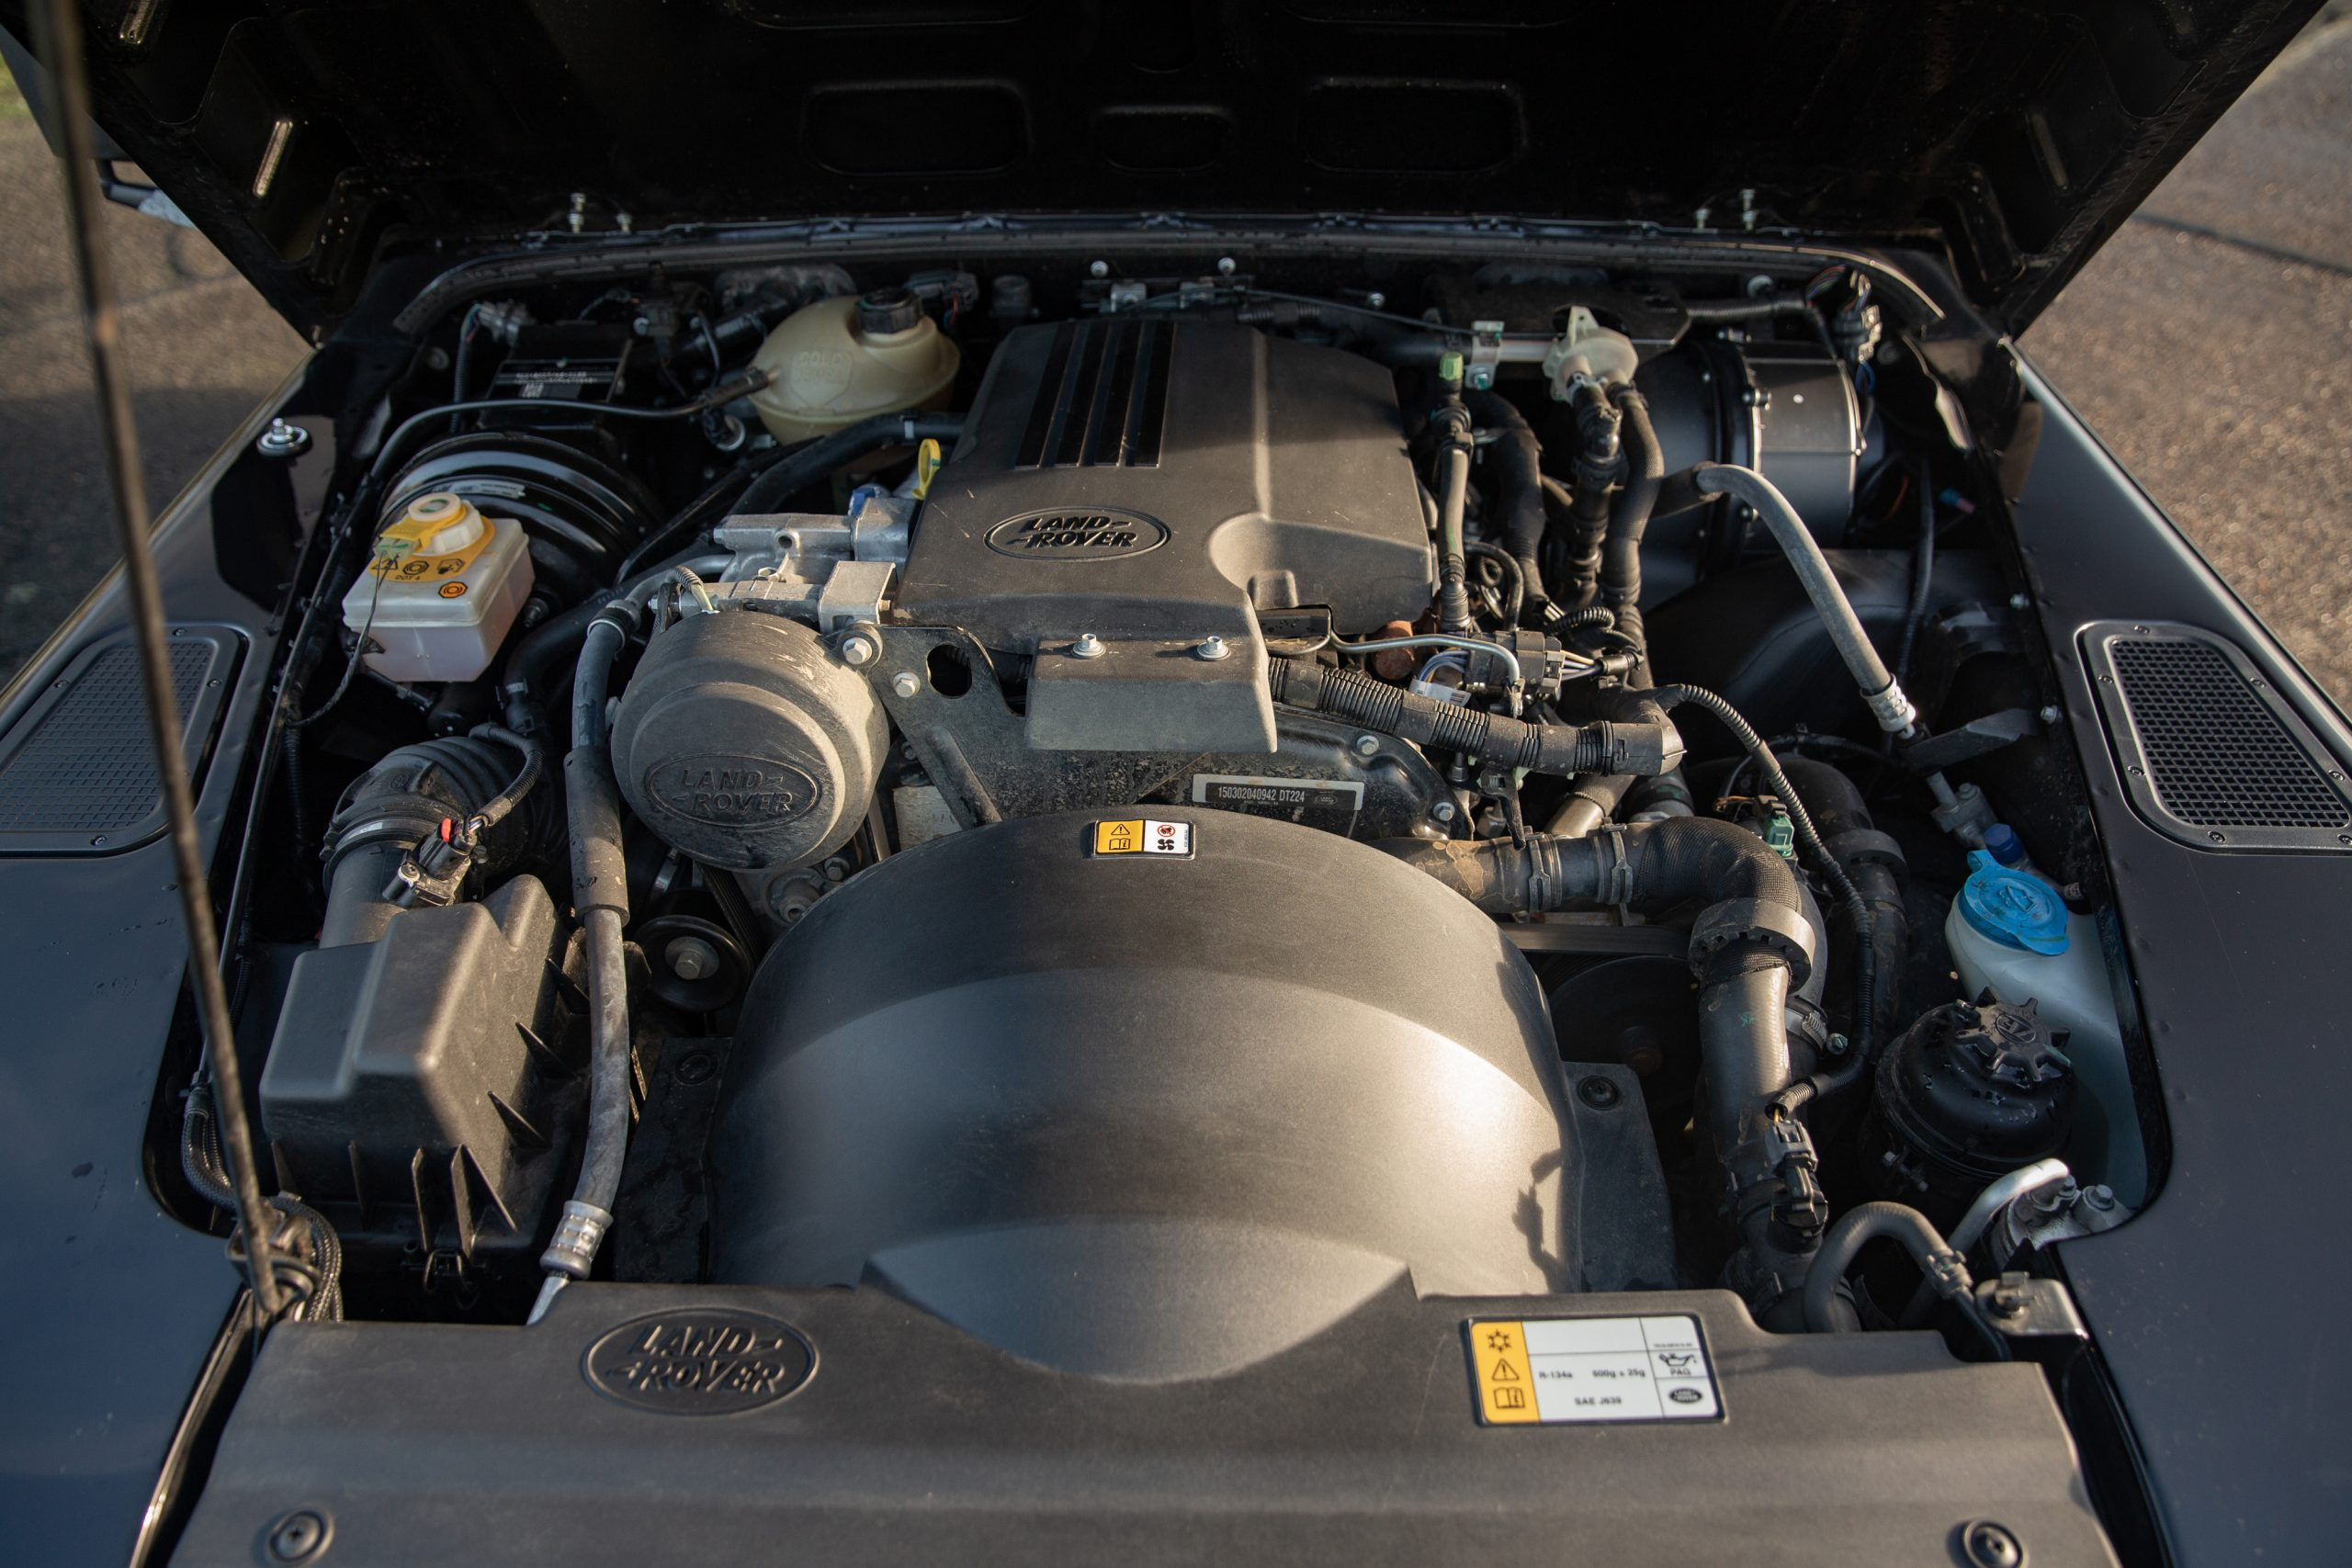 Land Rover Defender 90 Hardtop XS engine